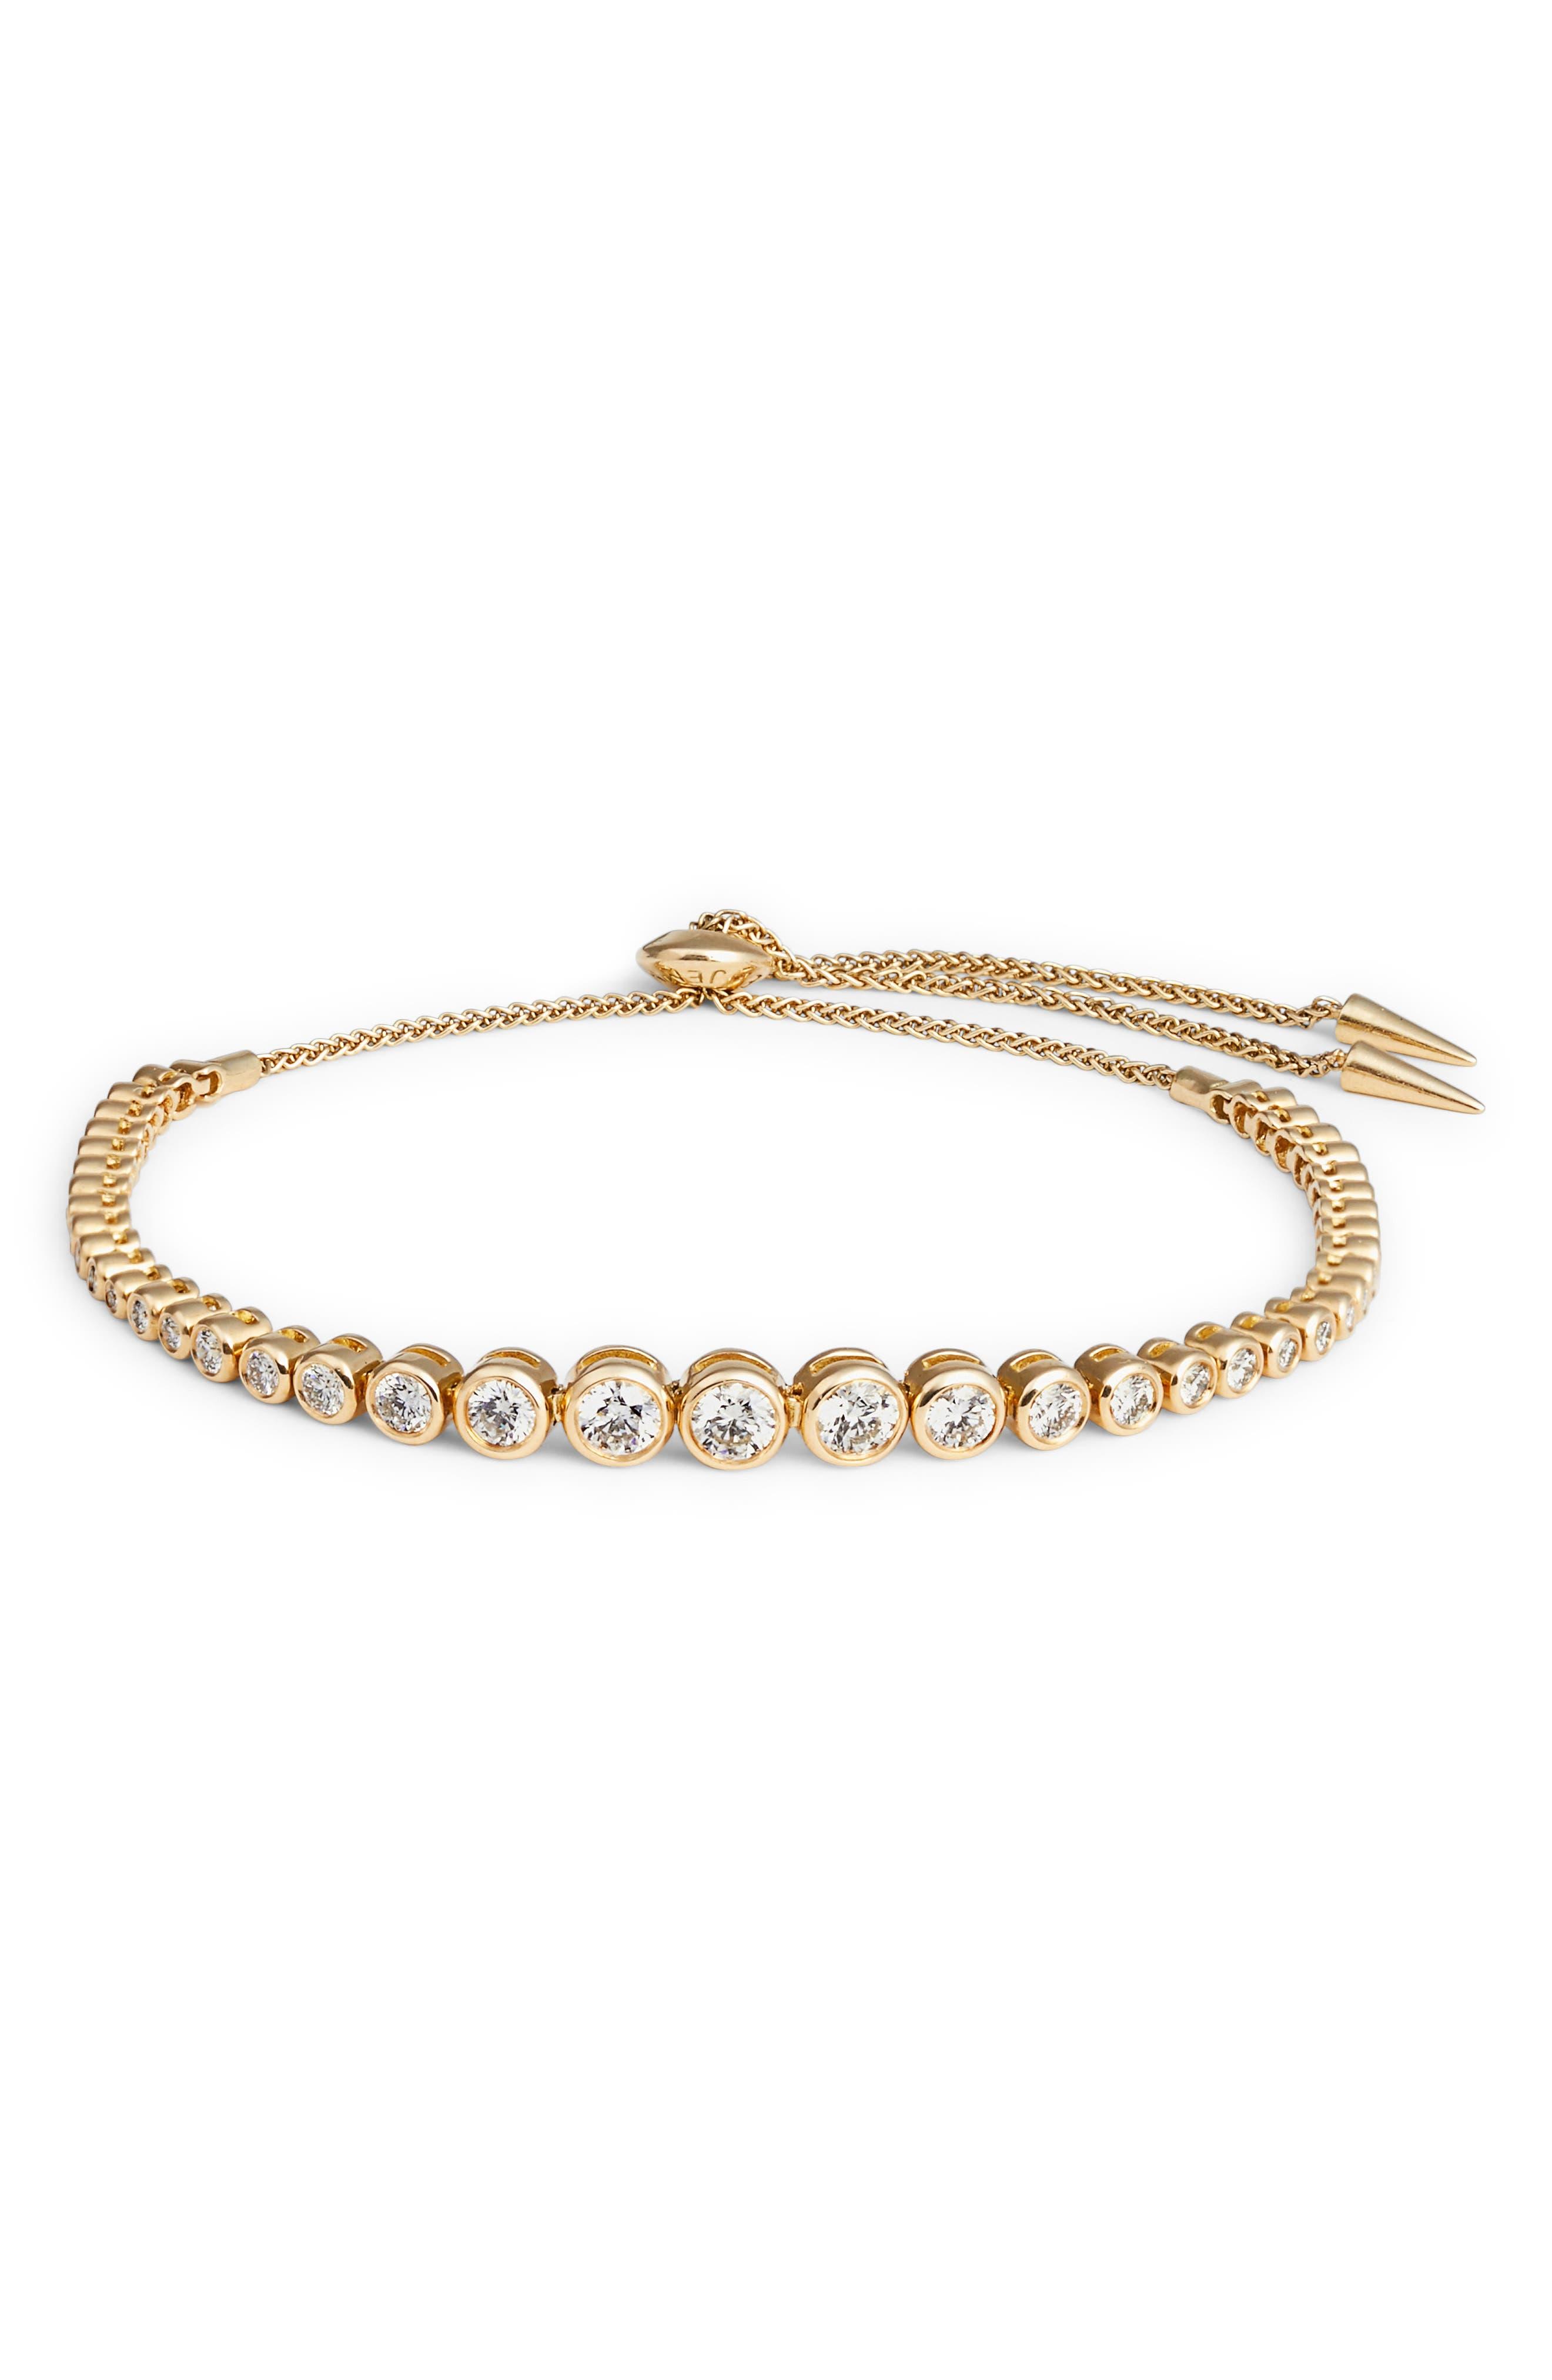 Jemma Wynne Prive Luxe Large Diamond Slider Bracelet